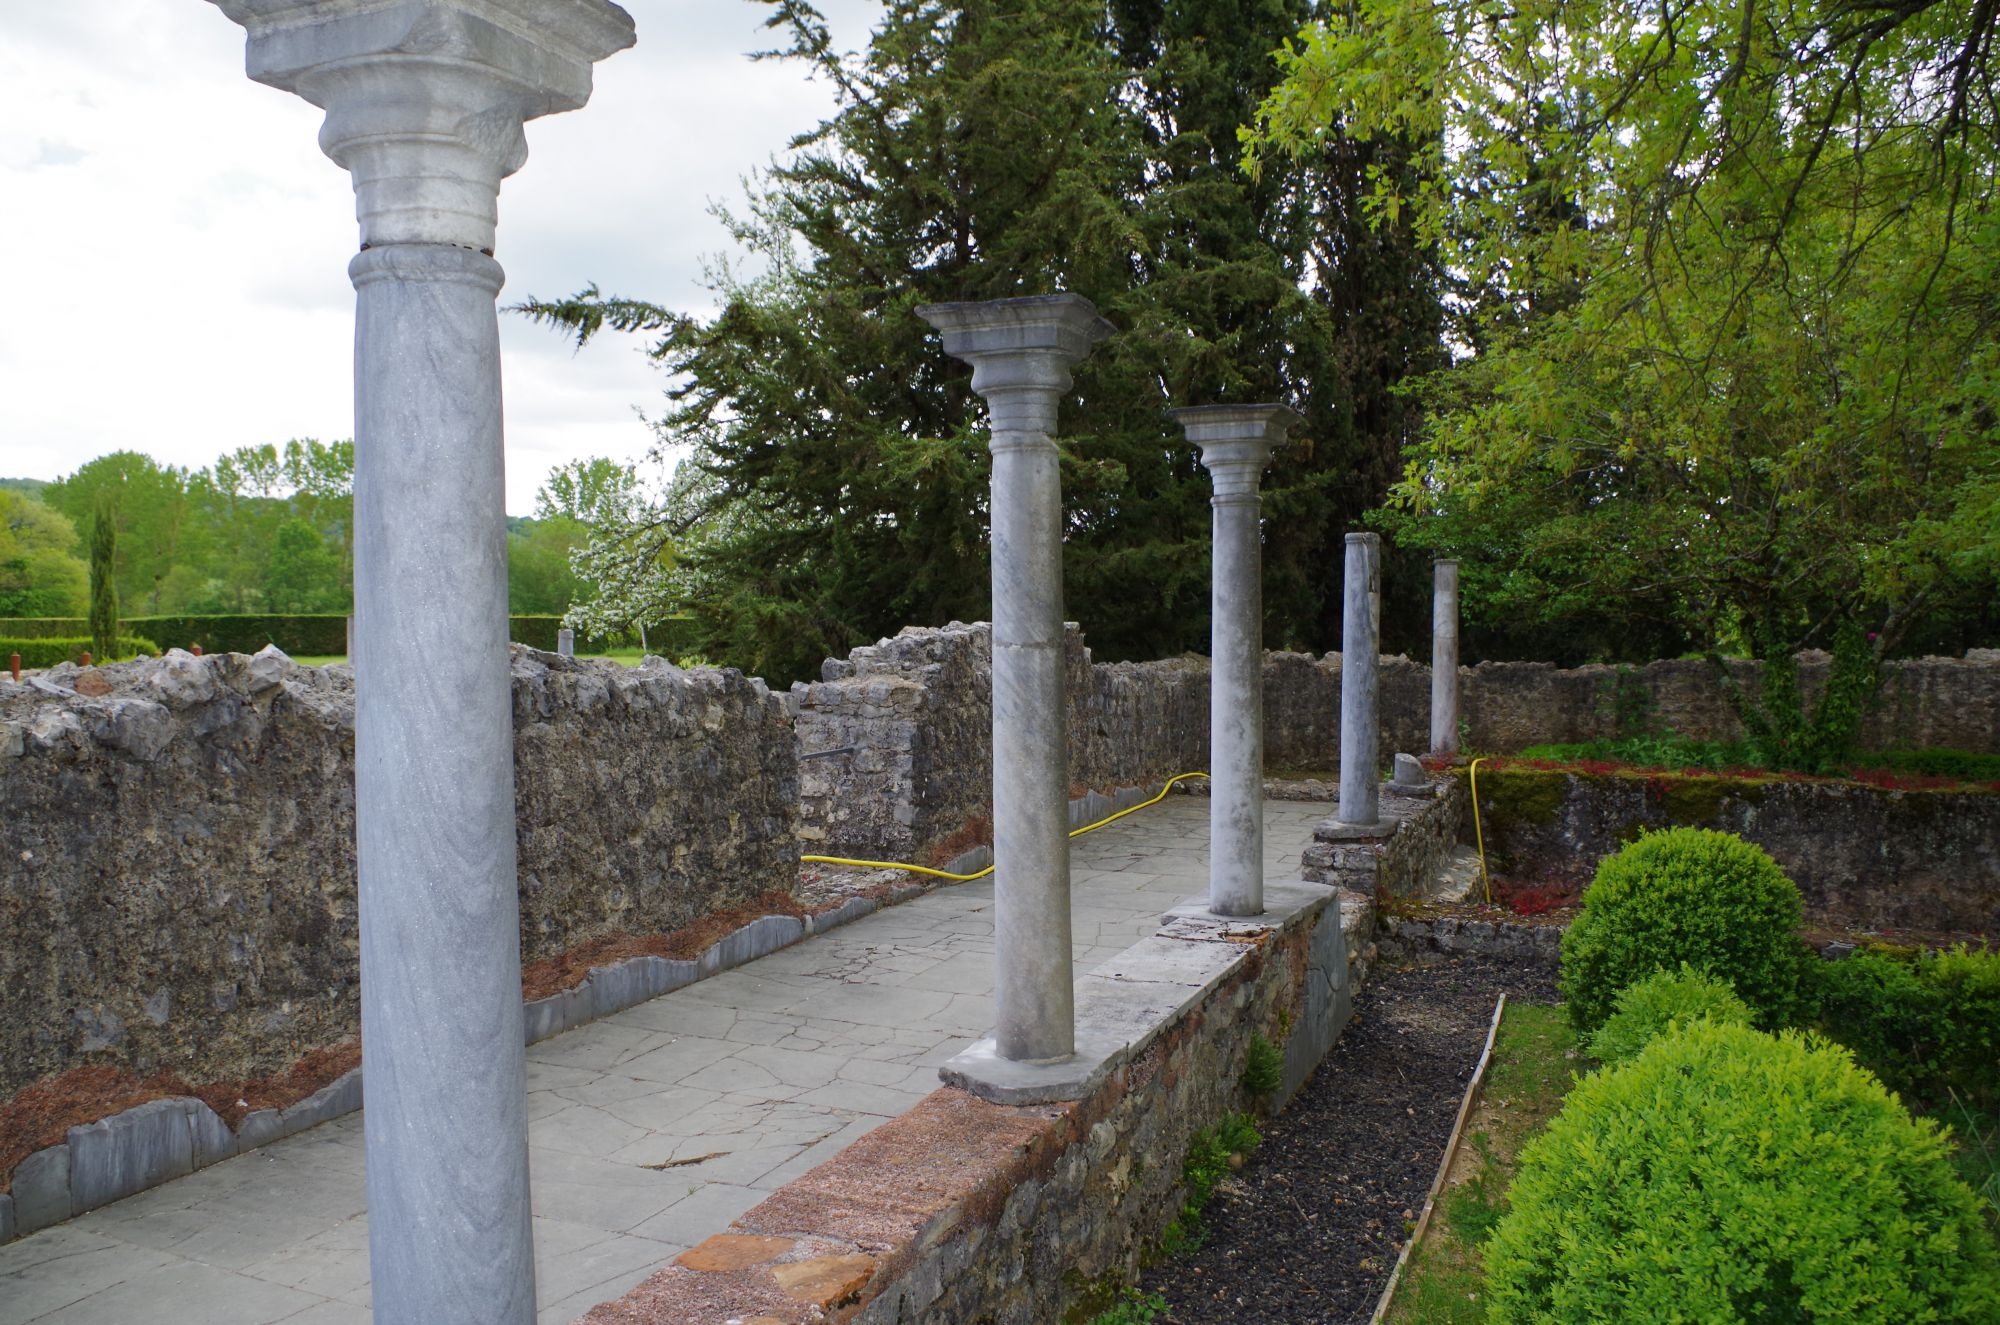 Colonnes de la Villa gallo-romaine de Montmaurin